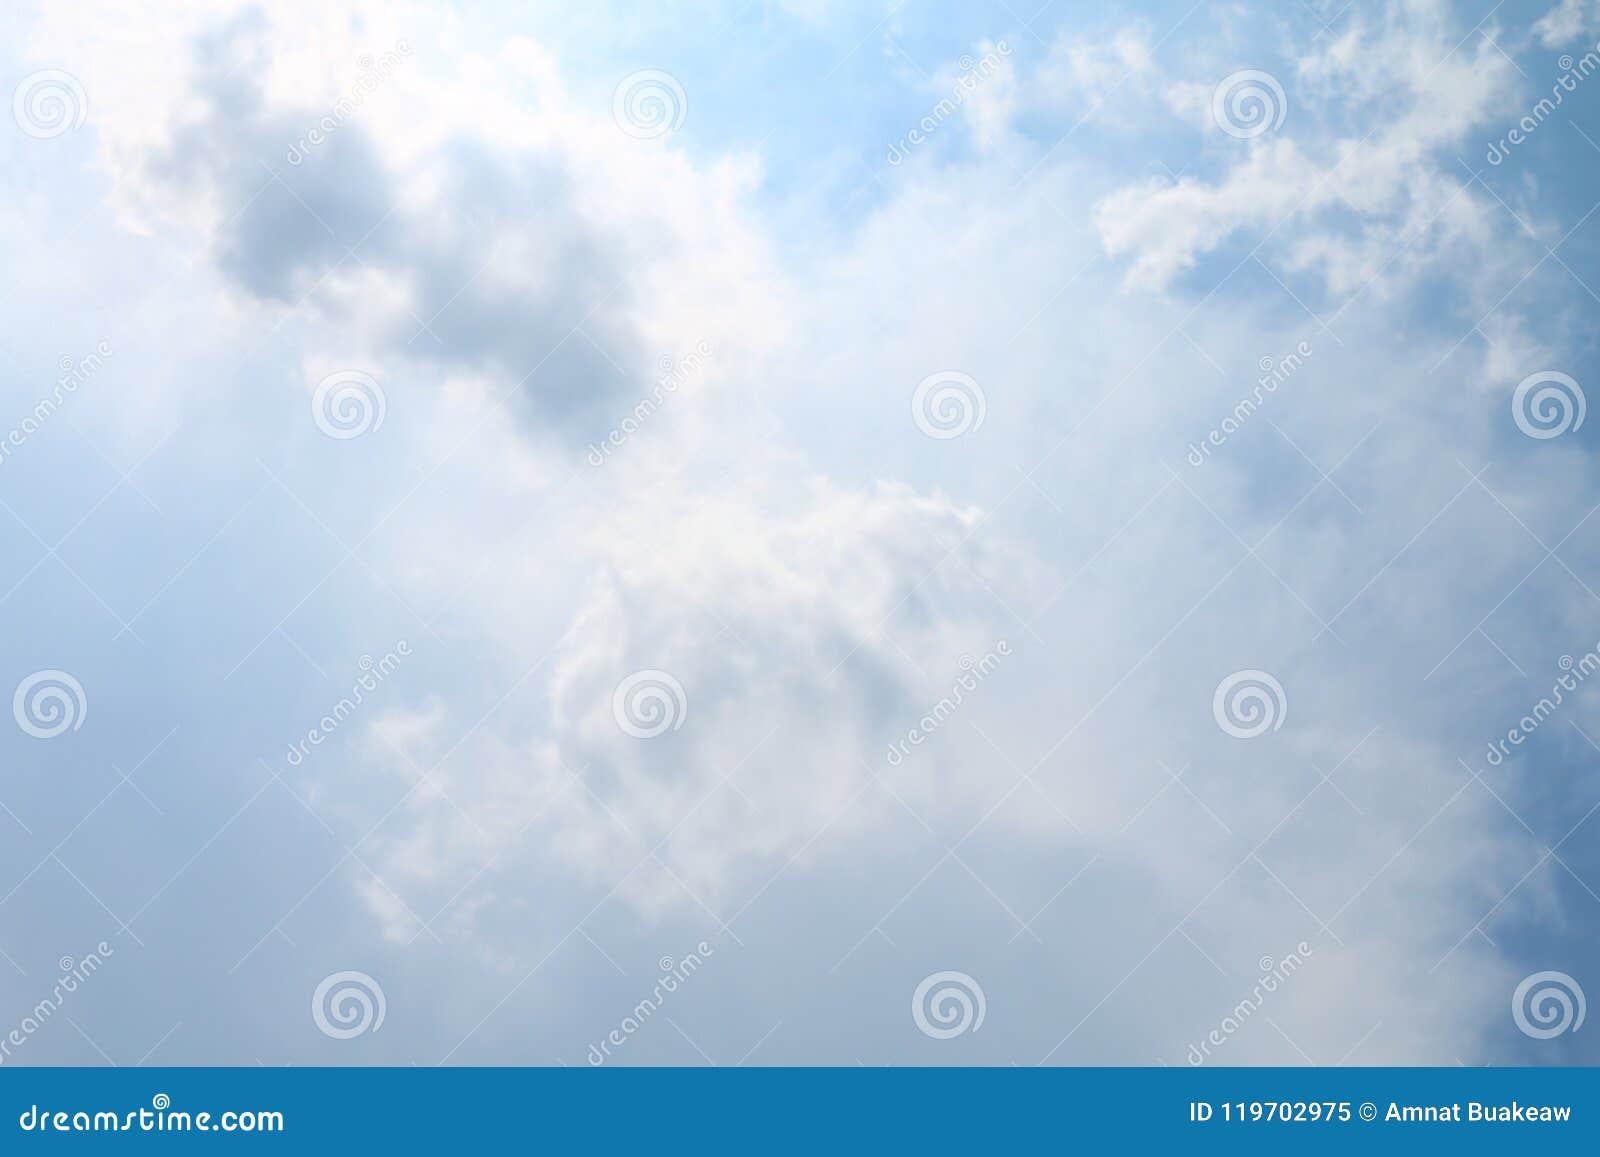 Sky, Soft Blue Sky Clear, Beautiful blue white sky fluffy clouds